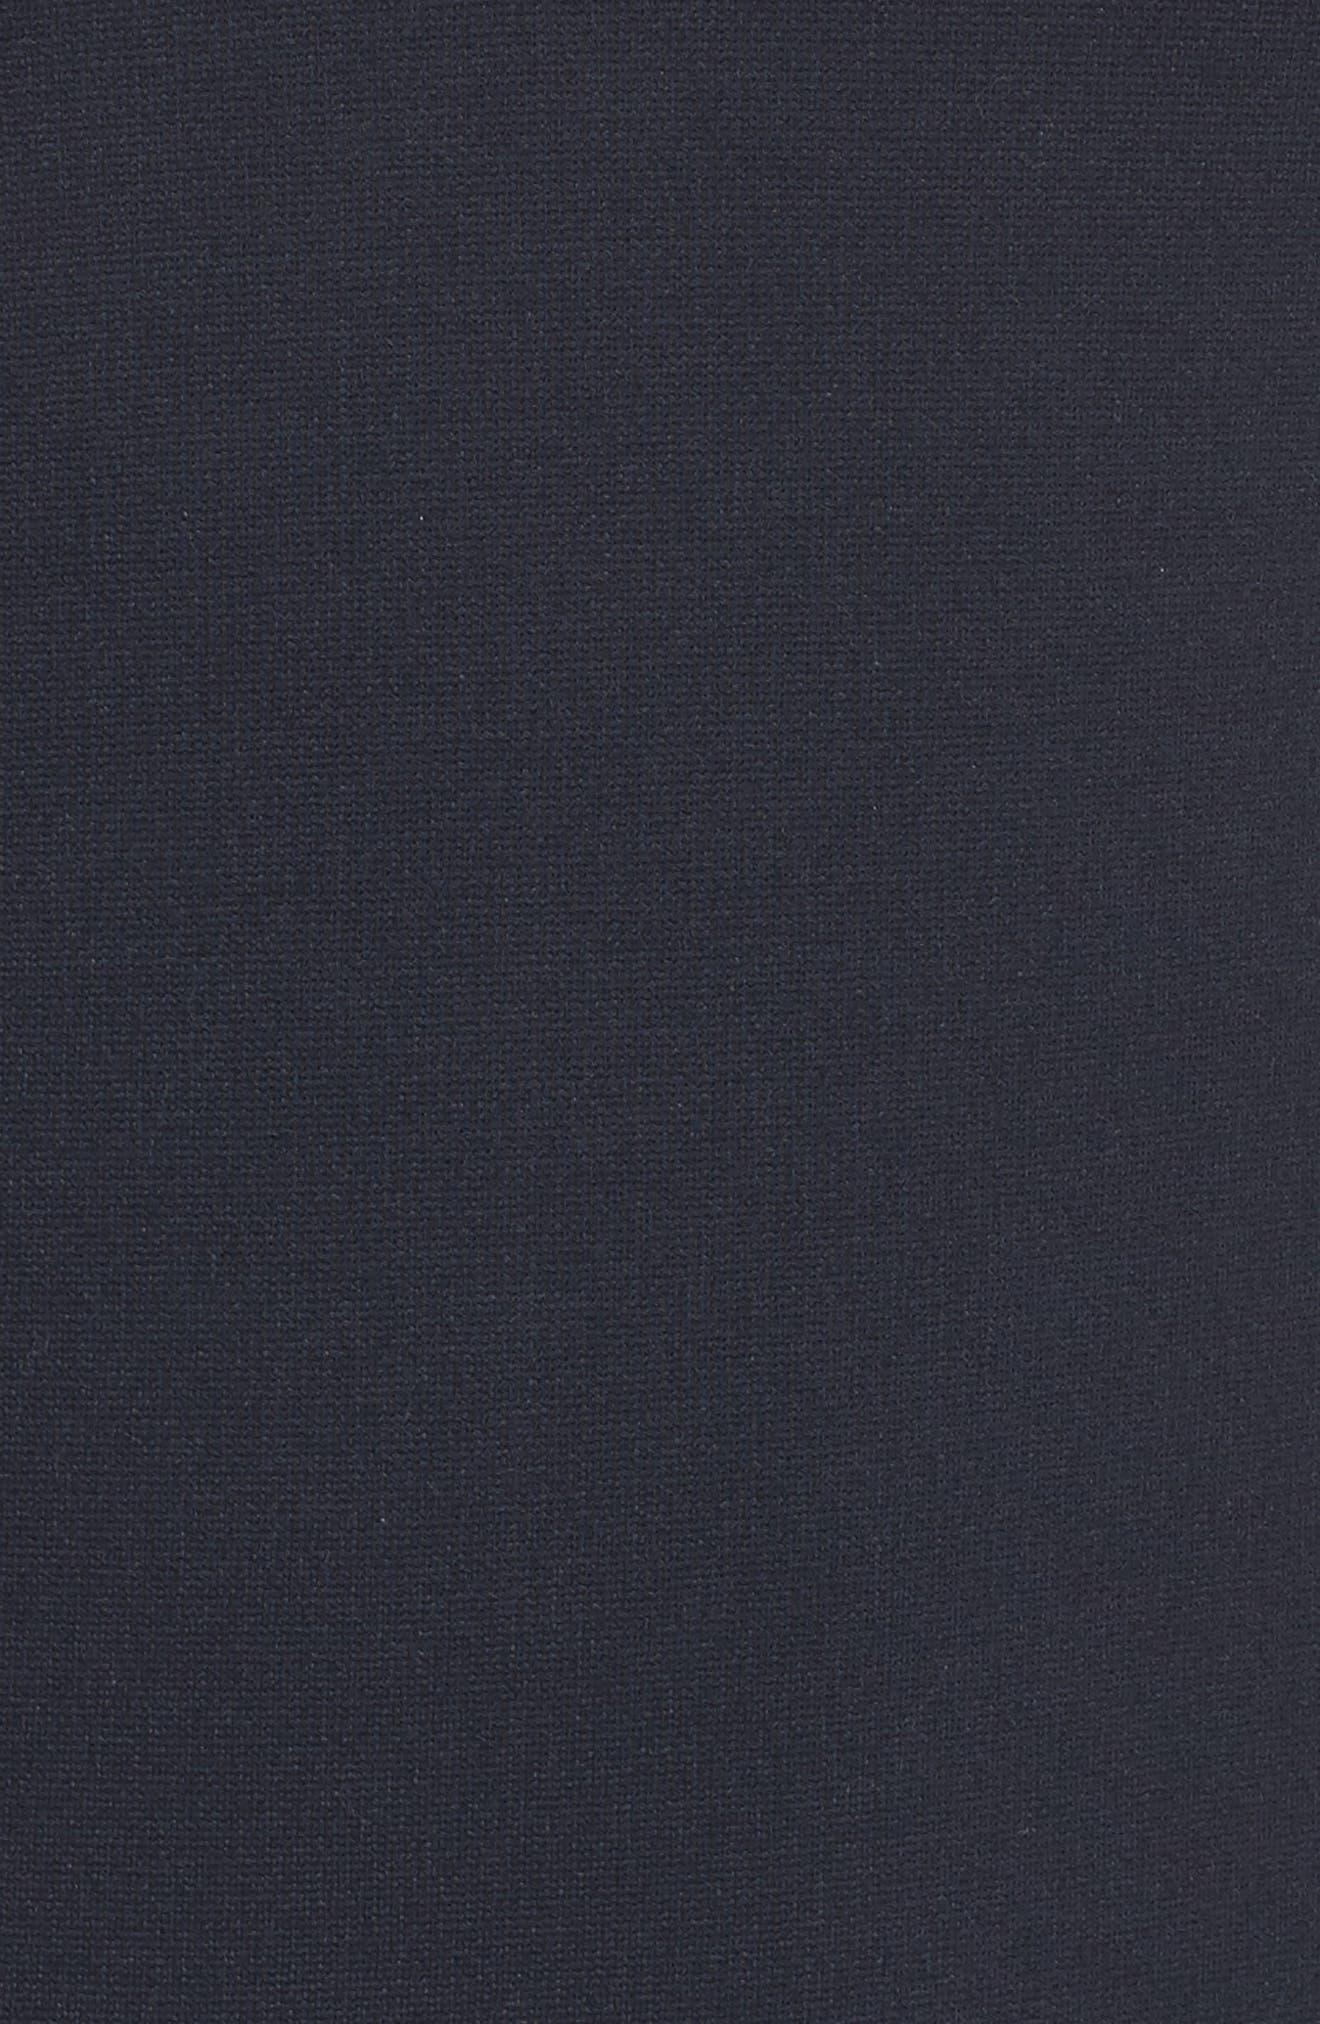 Ruffle Sheath Dress,                             Alternate thumbnail 5, color,                             410